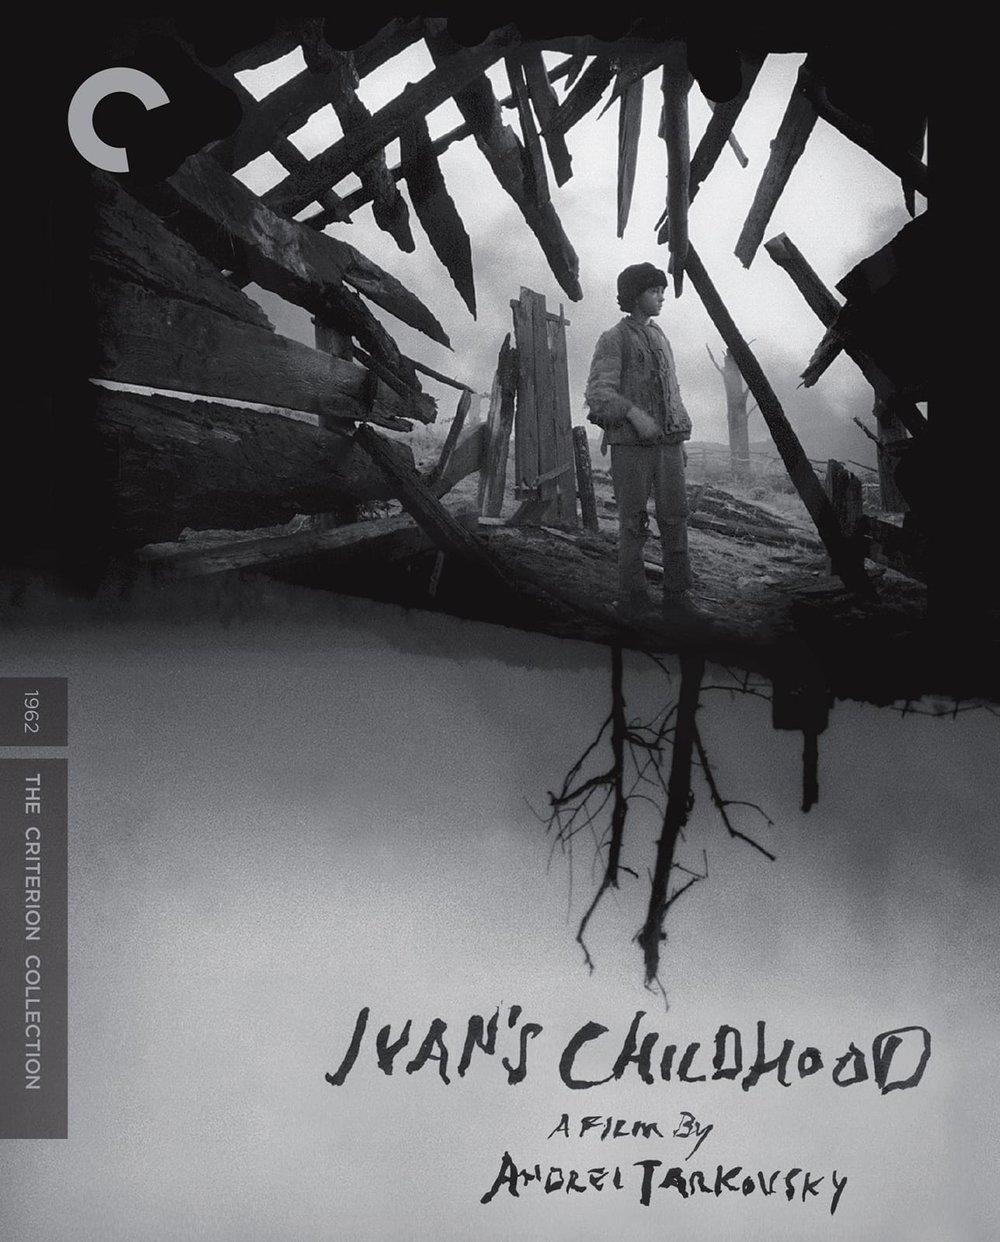 Ivan's Childhood (1962) - Directed by: Andrei TarkovskyStarring: Nikolay Burlyaev, Irina Tarkoskaya, Evgeniy ZharikovRated: Running Time: 1 h 24 mTMM Score: 5 stars out of 5STRENGTHS: Acting, Directing, CinematographyWEAKNESSES: -